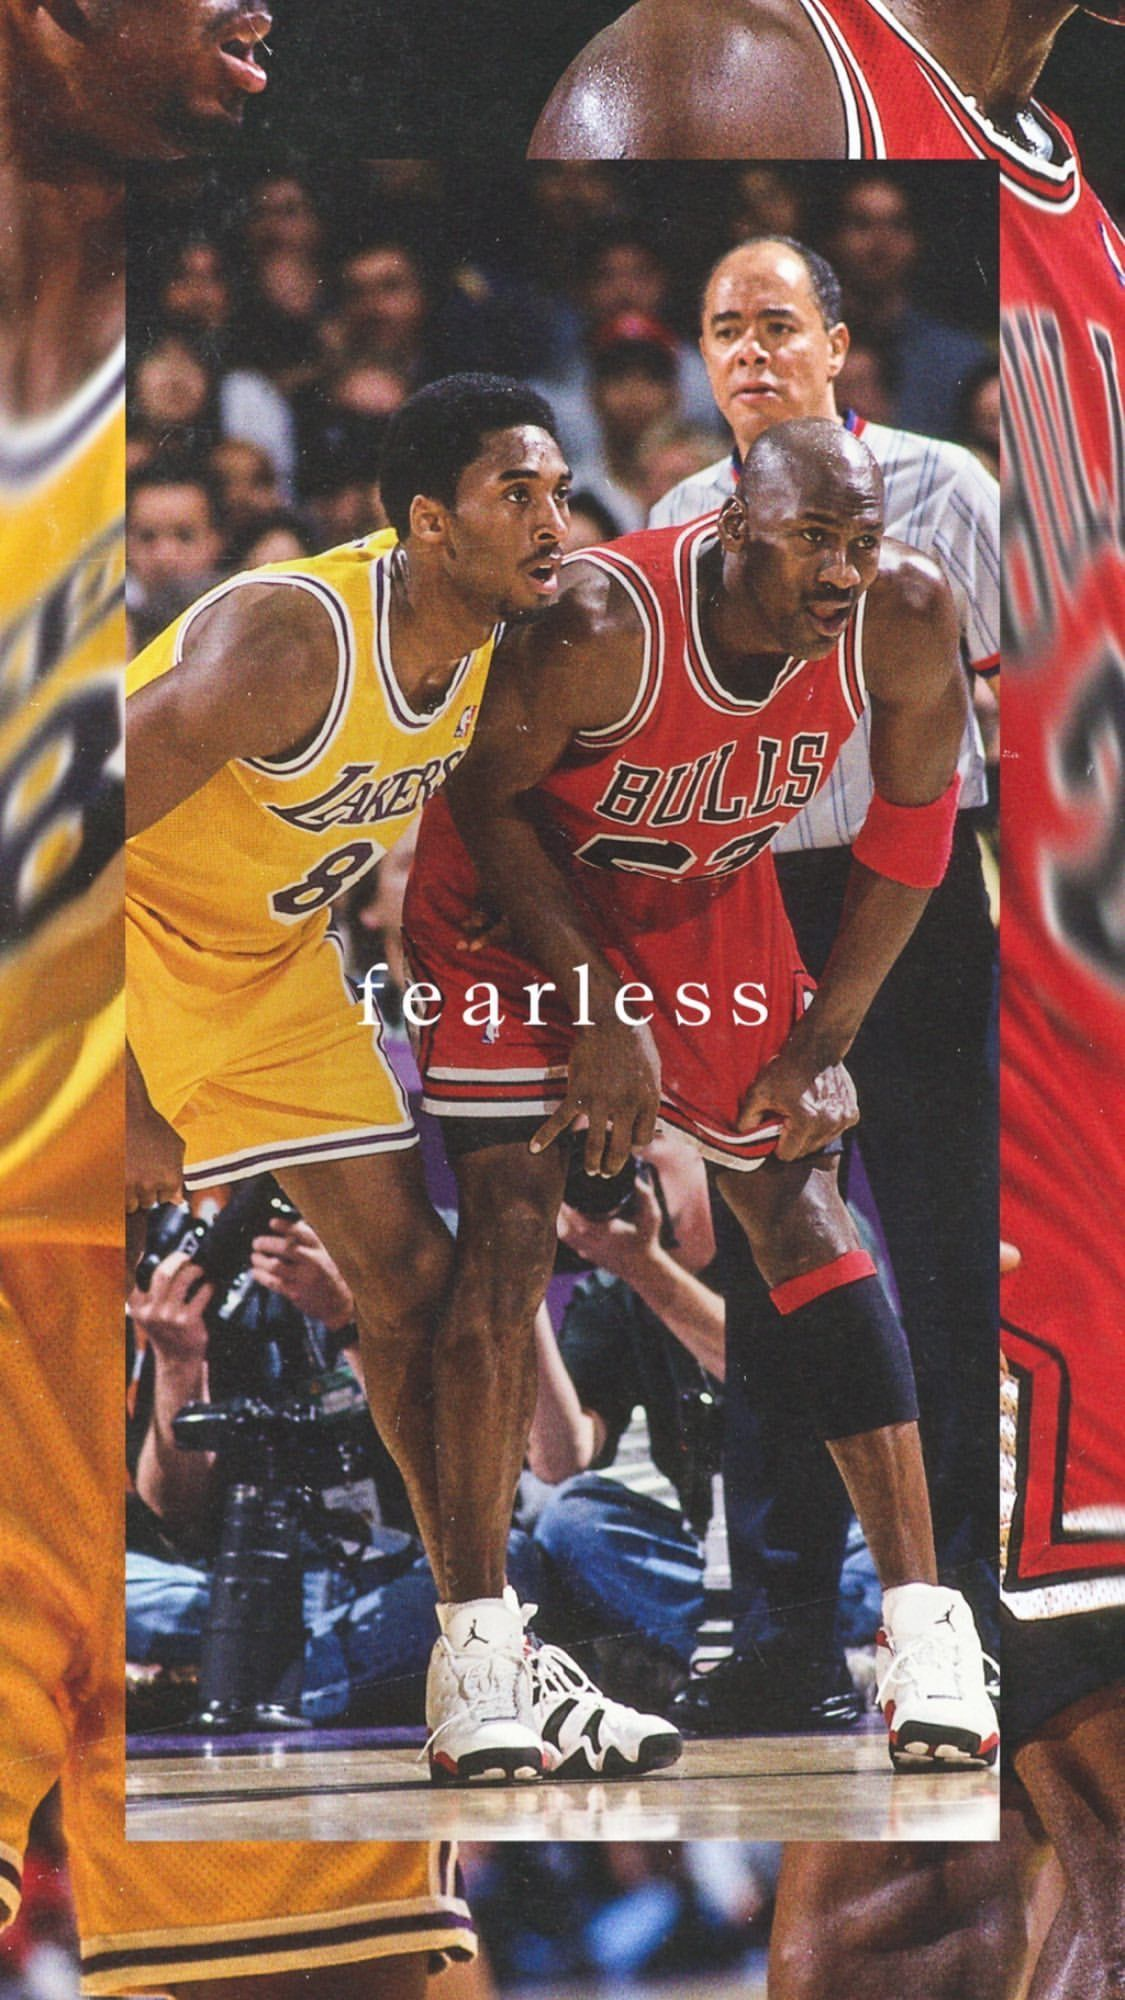 Pin By Kyrsten Crawford On Discipline In 2021 Kobe Bryant Wallpaper Kobe Bryant Poster Kobe Bryant Pictures Iphone kobe and michael jordan wallpaper